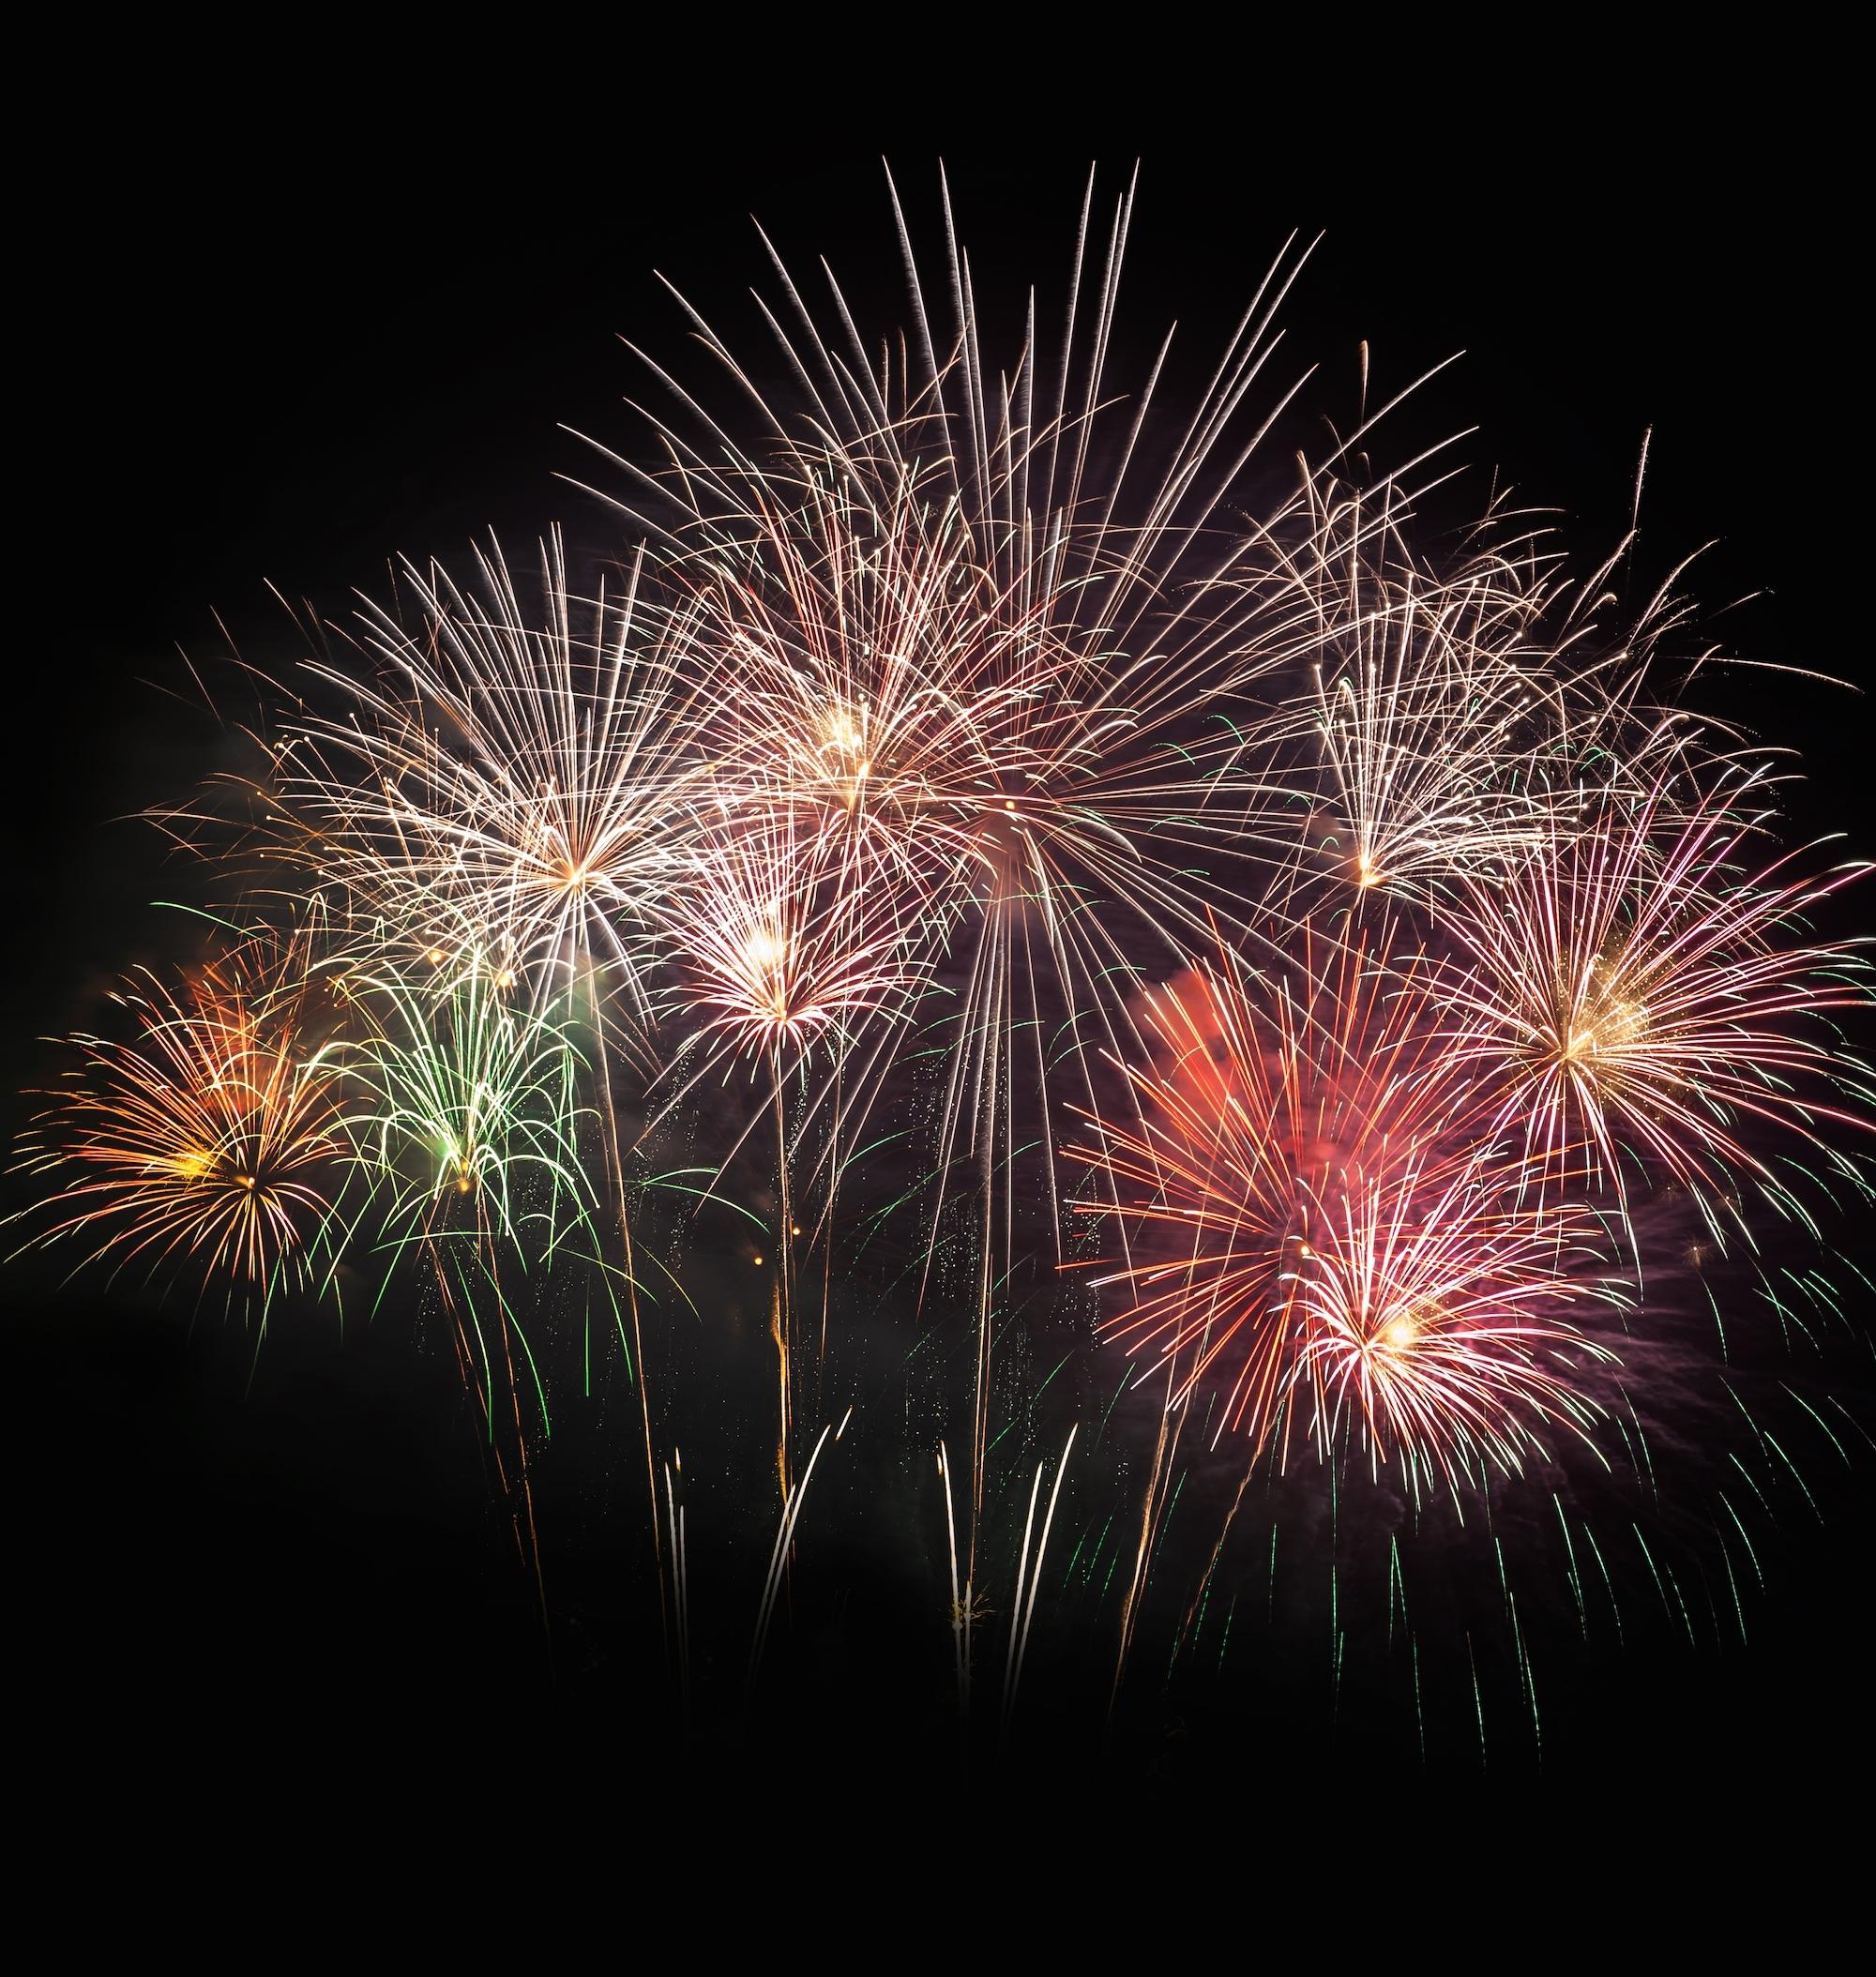 f06a8051475712541fe3_40053e271810c210bce2_Fireworks.jpg